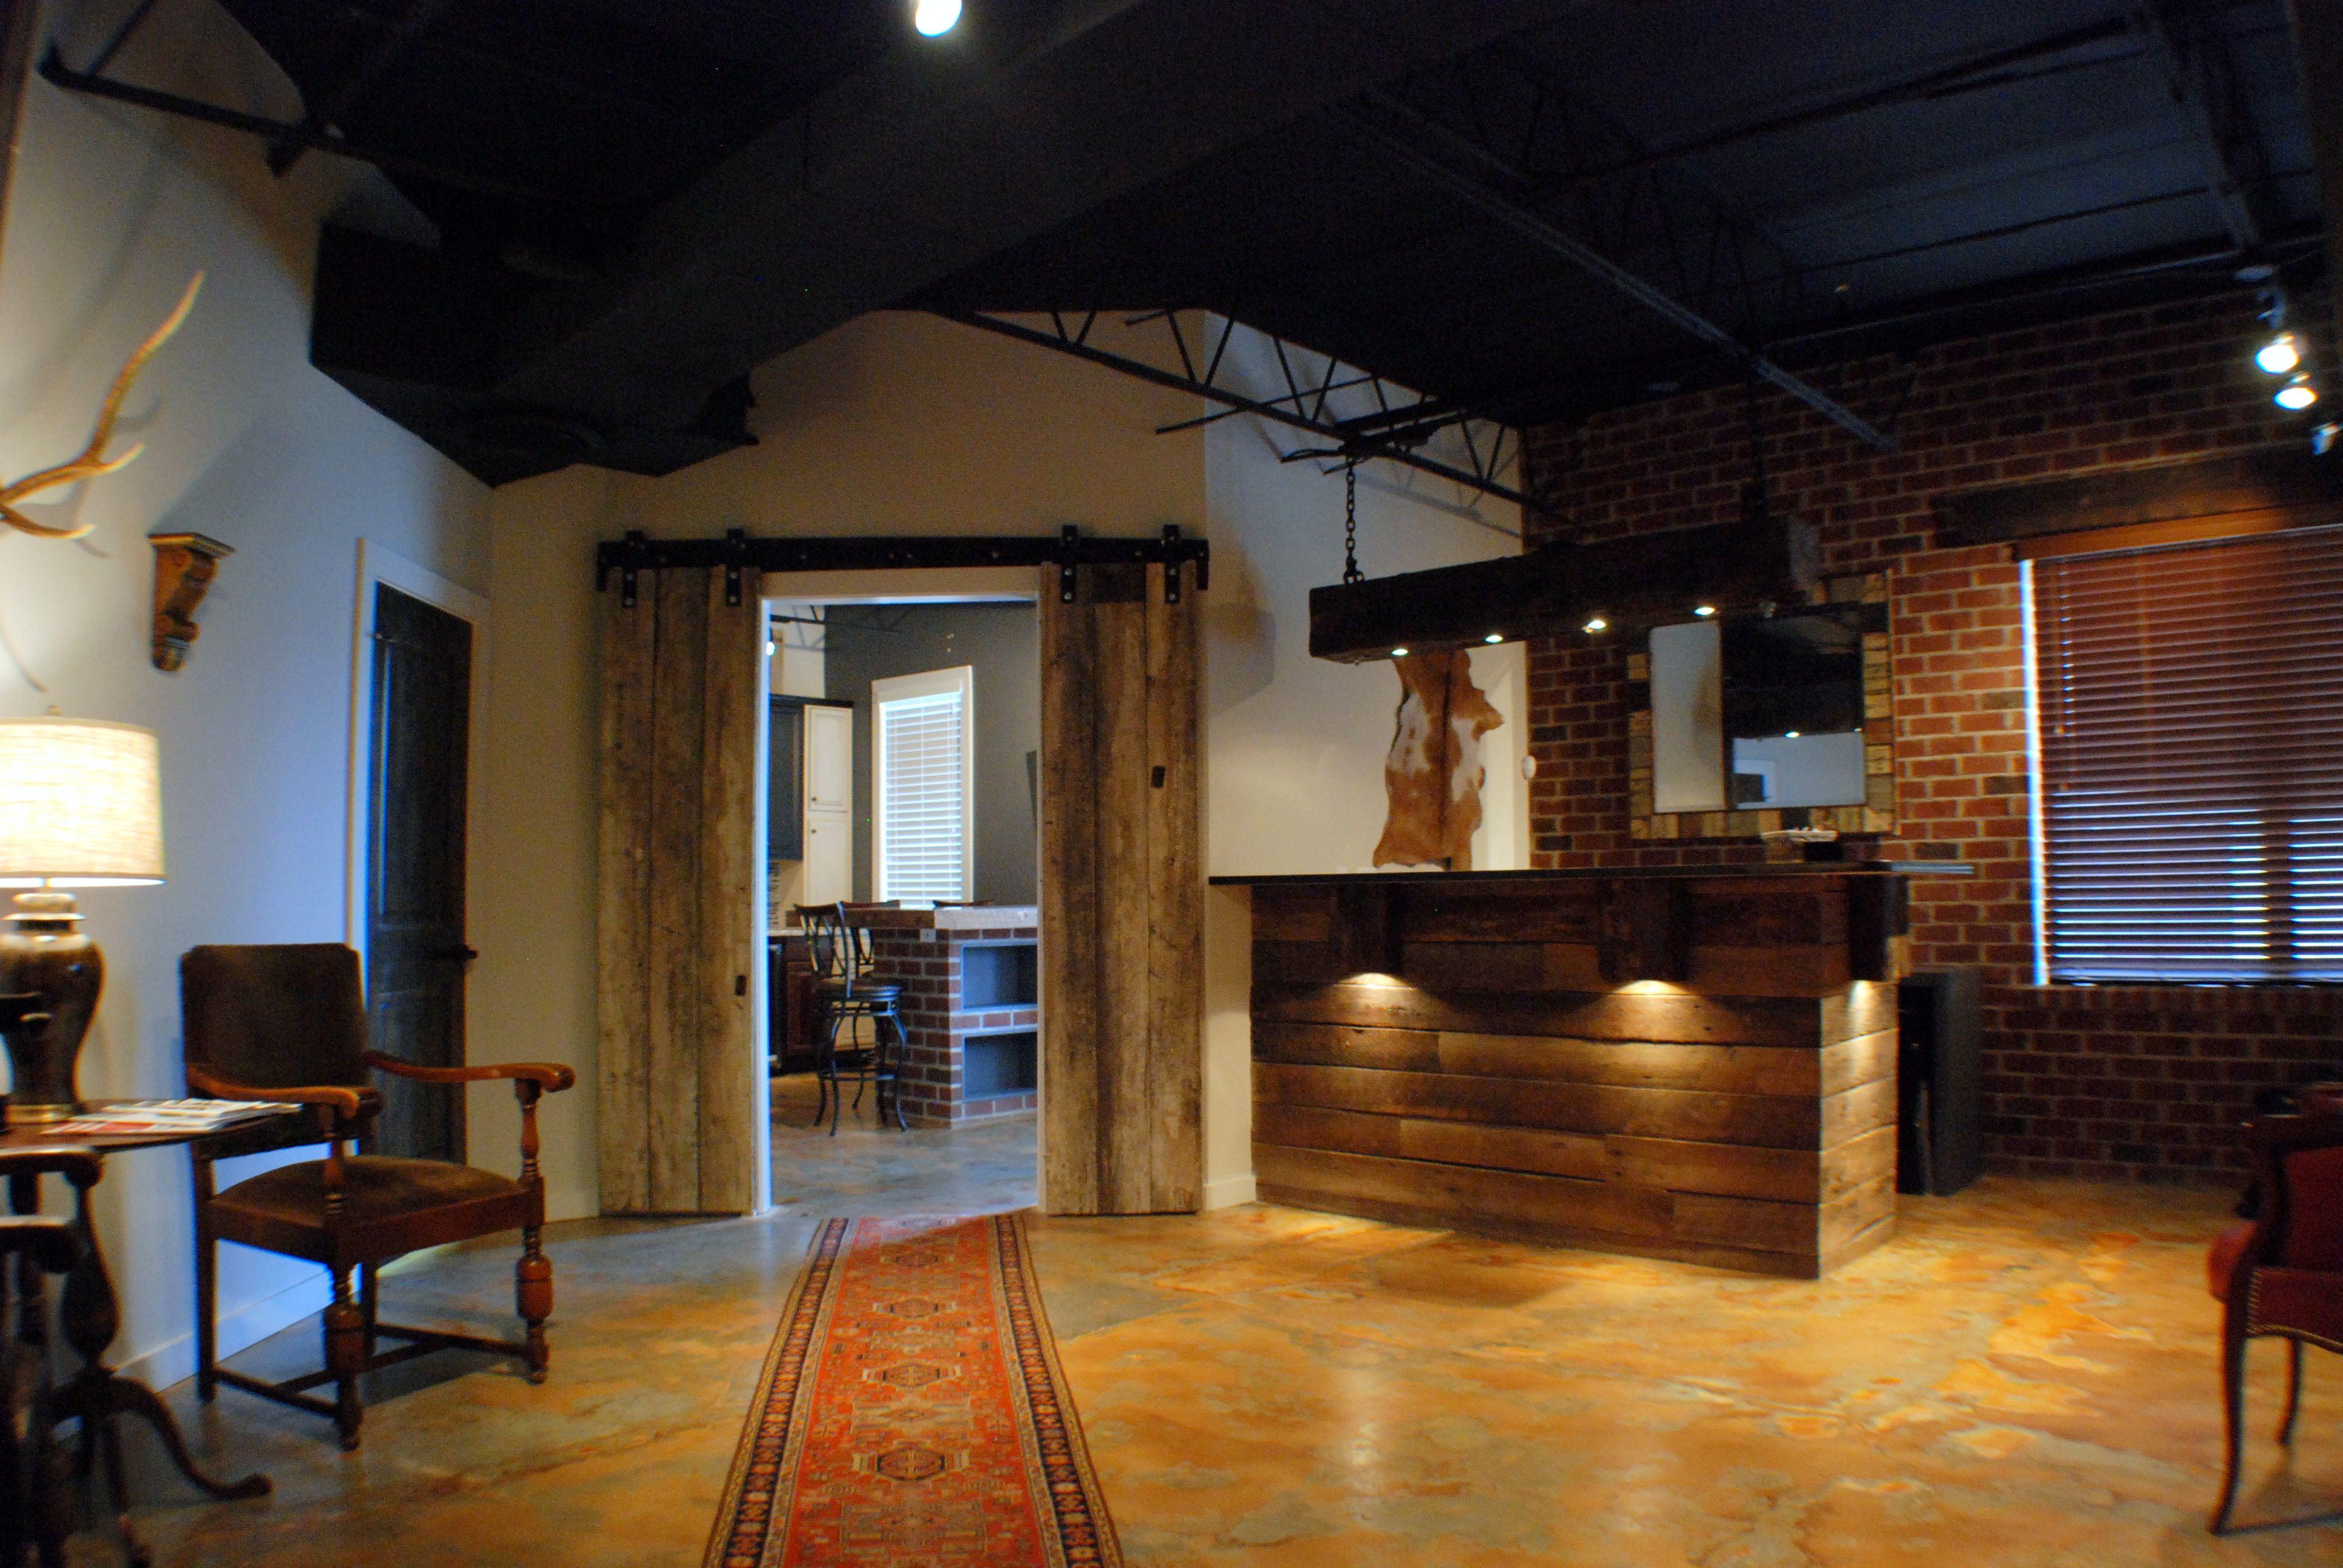 Custom Barn Doors, Reception Desk Made Of Reclaimed Wood, Exposed